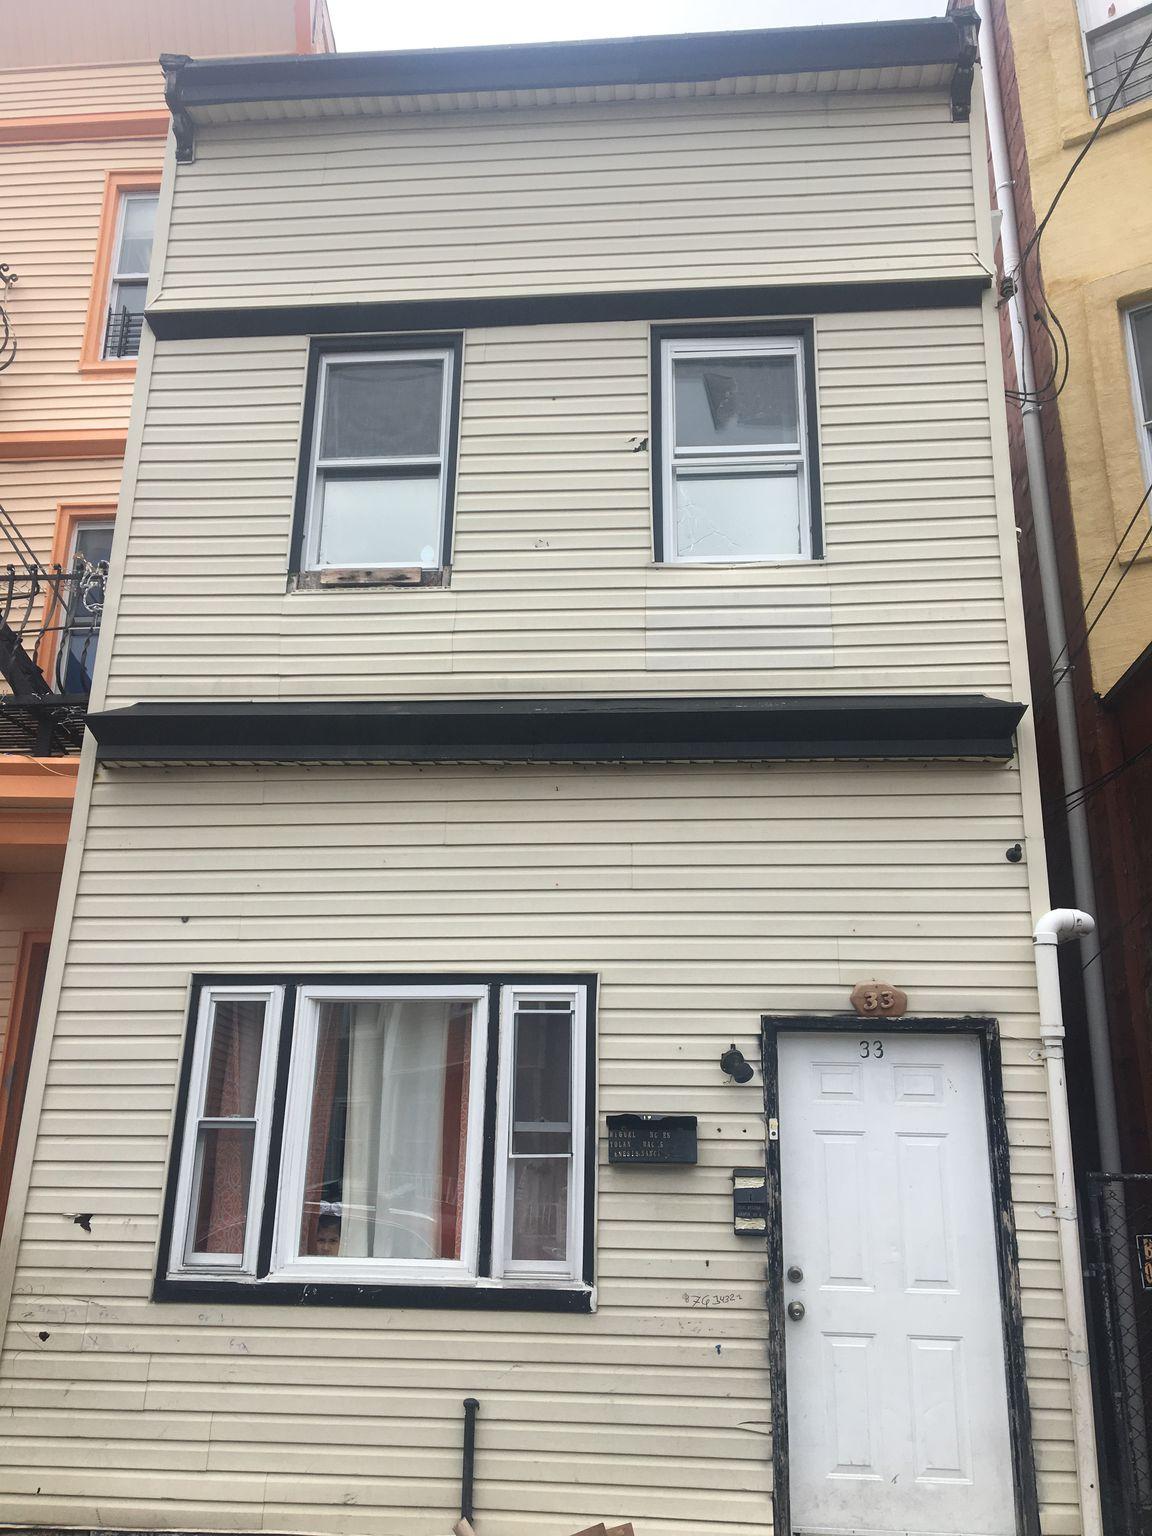 33 Jackson St For Sale - Passaic, NJ | Trulia